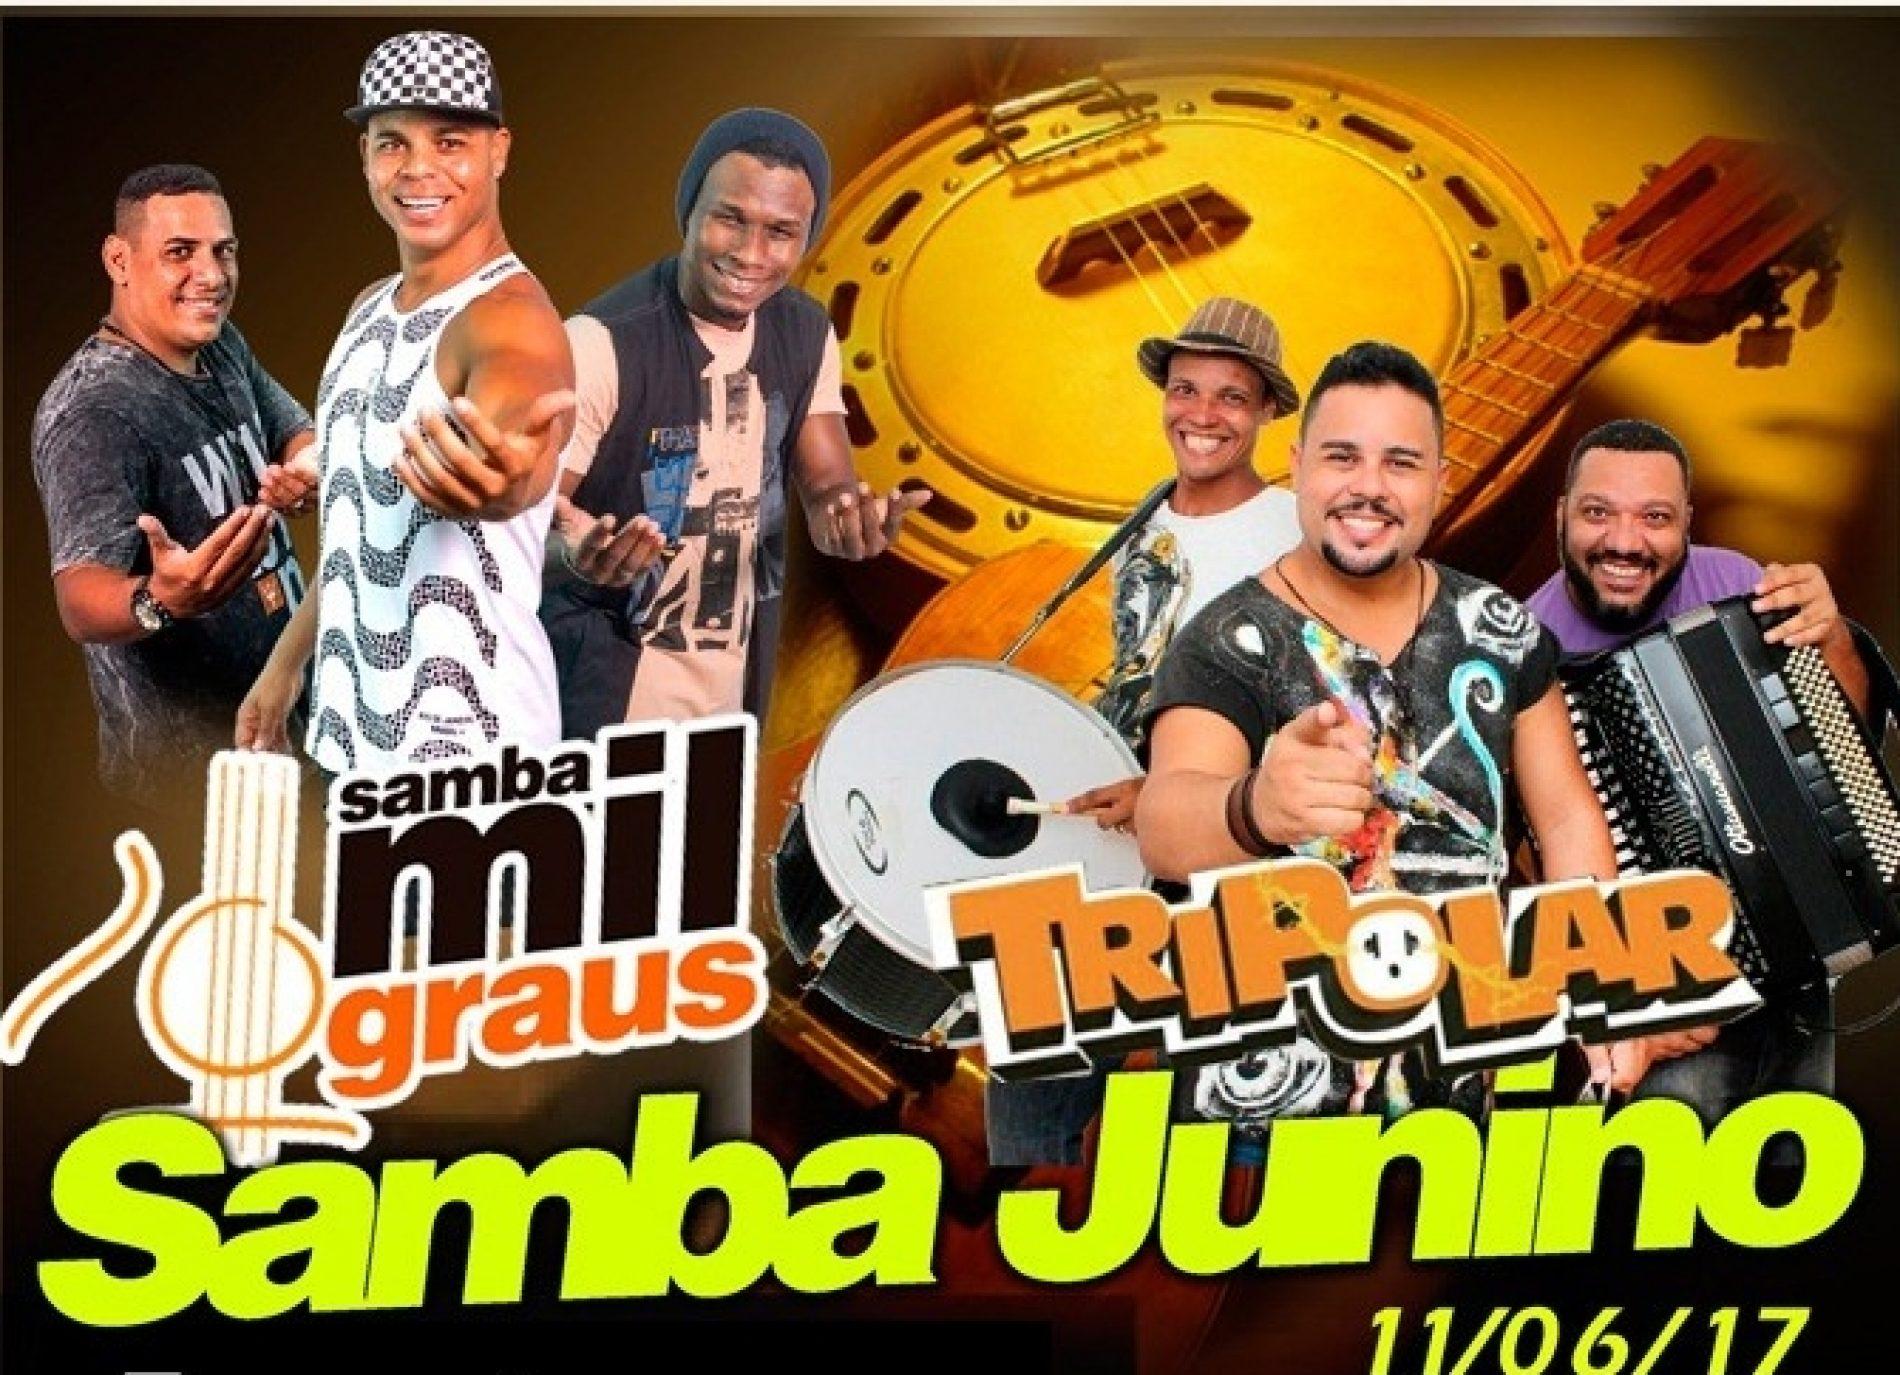 Tripolar e Samba Mil Graus animam Samba Junino neste domingo na Boca do Rio